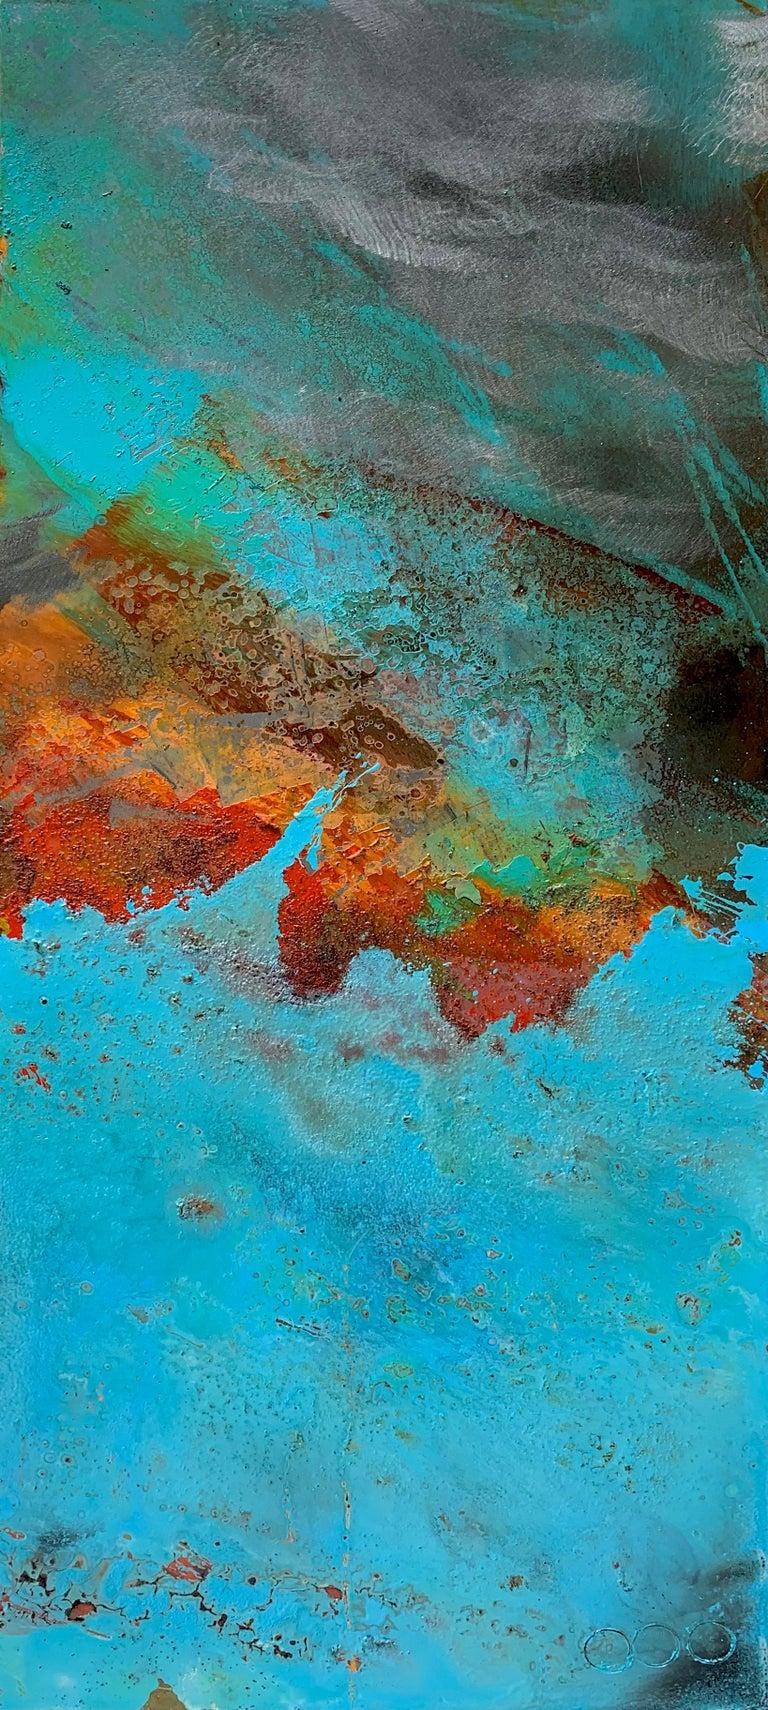 Artist: Sam Peacock  Title: Victoria  Materials: Oil, Coffee and Parafin on steel  Medium: Mild steel sheet  Size: 85 x 35 cm  Edition: Original Artwork  Year: 2018  _________________________________________________________________________  Sam